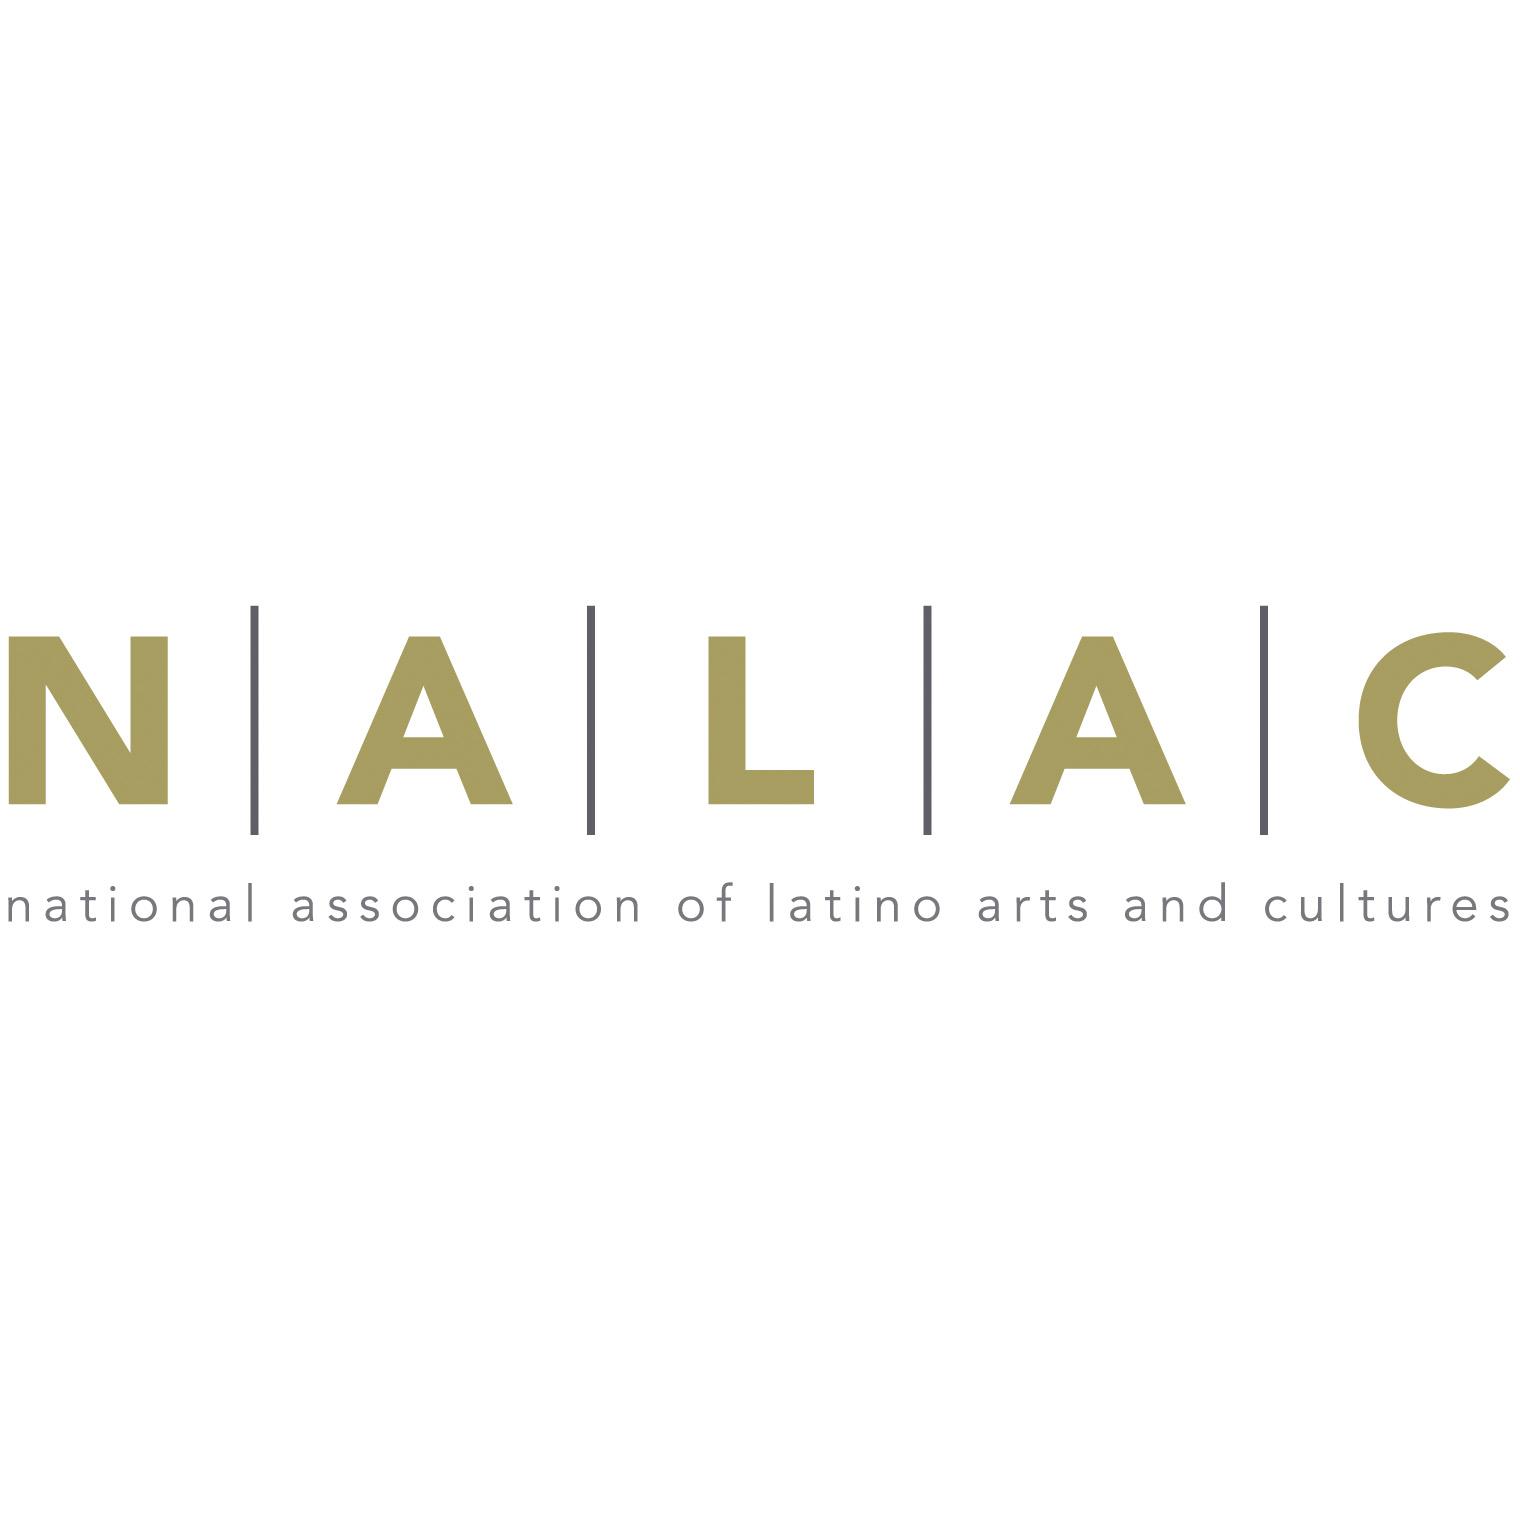 2016NALAC_Logo_Color_Print-1700x300dpi